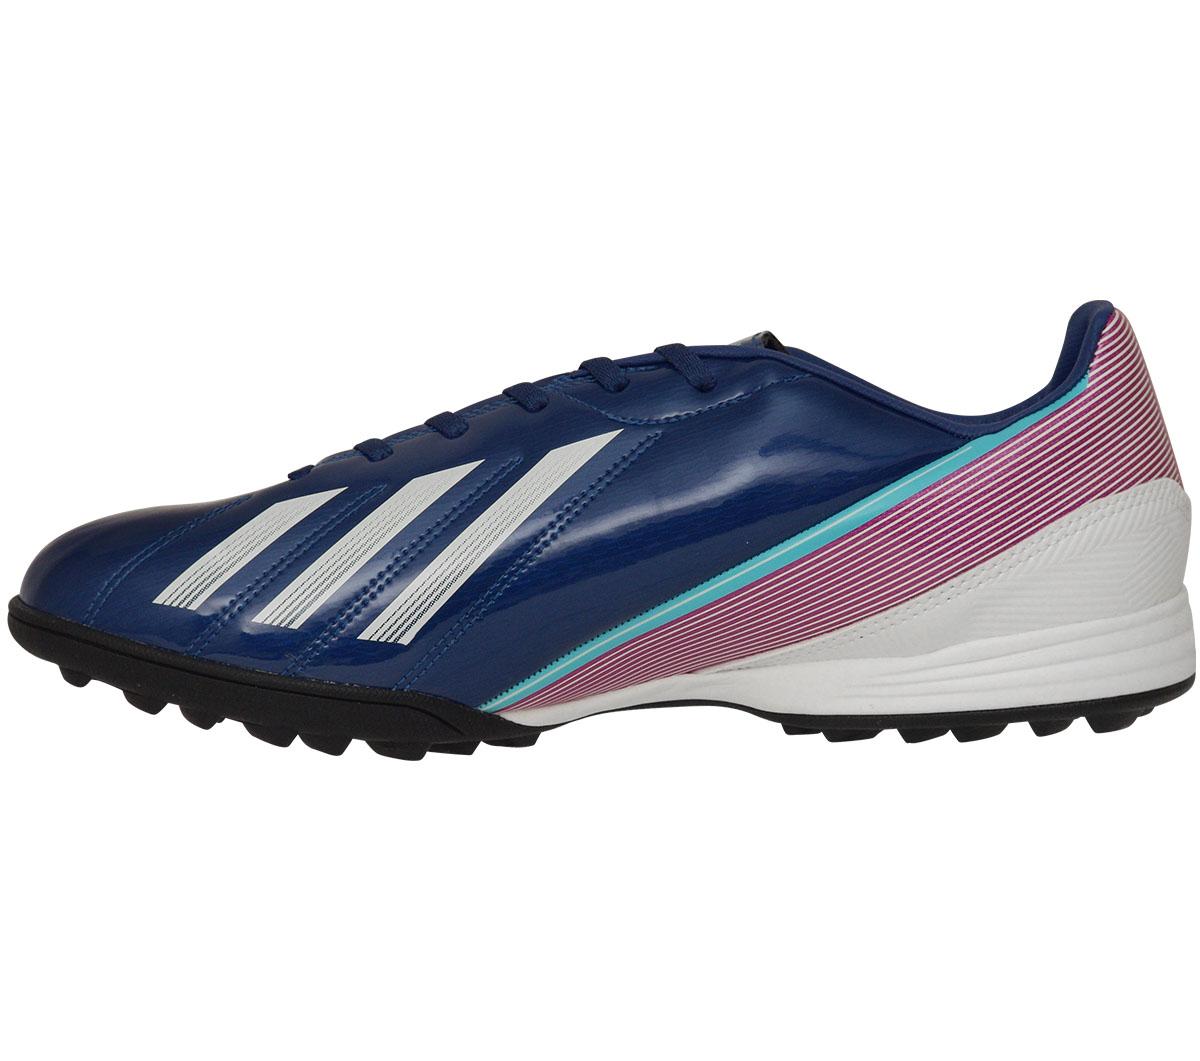 05f8837f2d Chuteira Adidas F10 TRX Society Azul - Mundo do Futebol